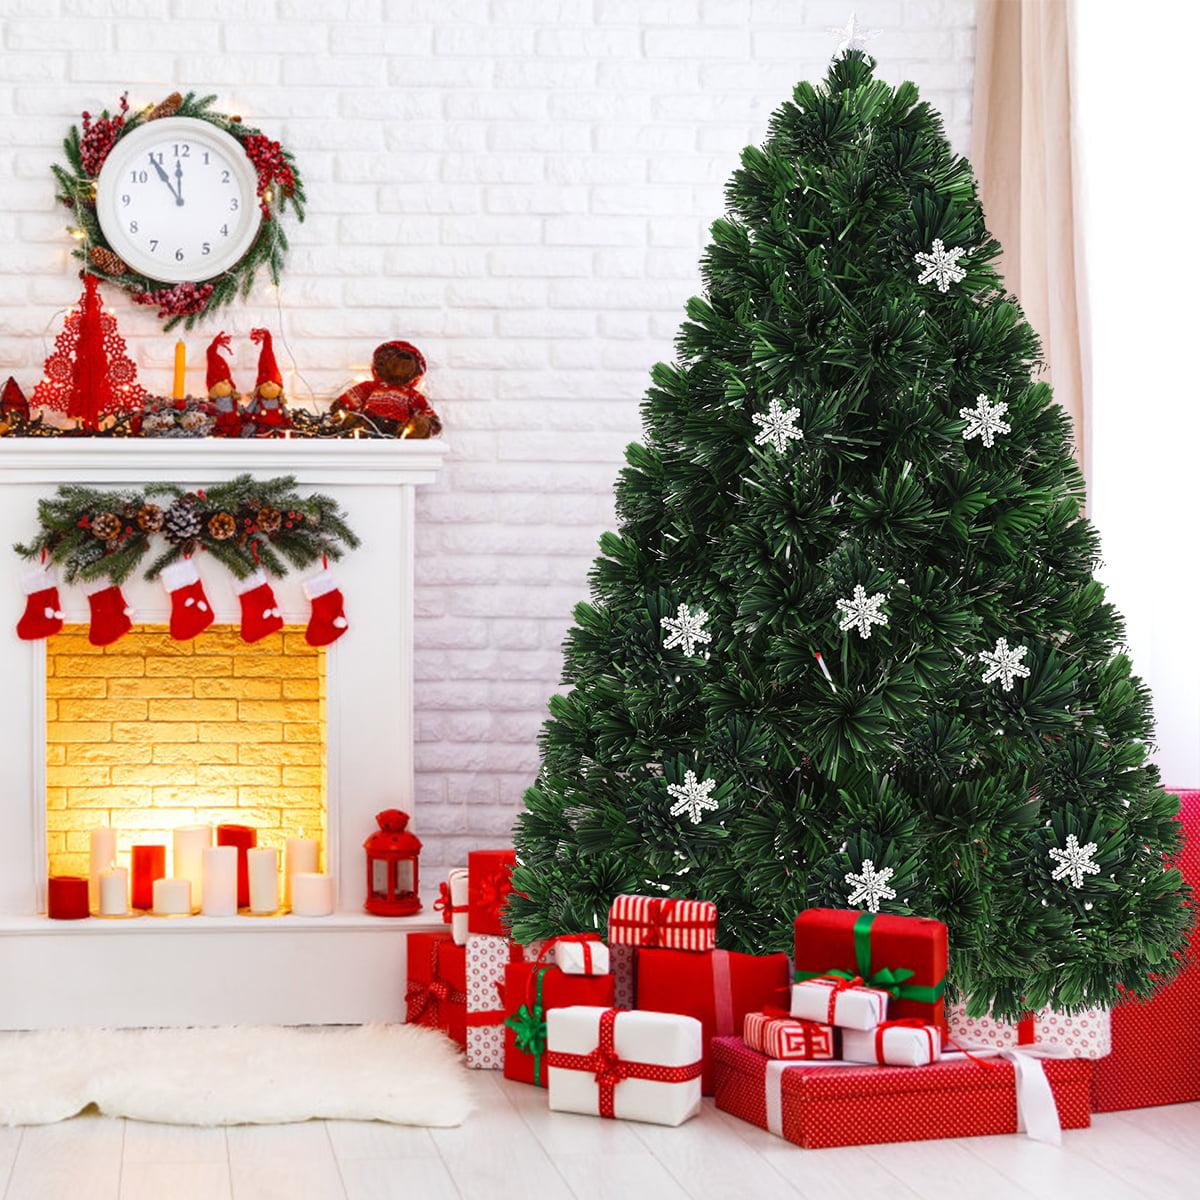 7 5 Fiber Optic Christmas Tree: Gymax 7' Pre-Lit Multi-Color Lights Fiber Optic Artificial